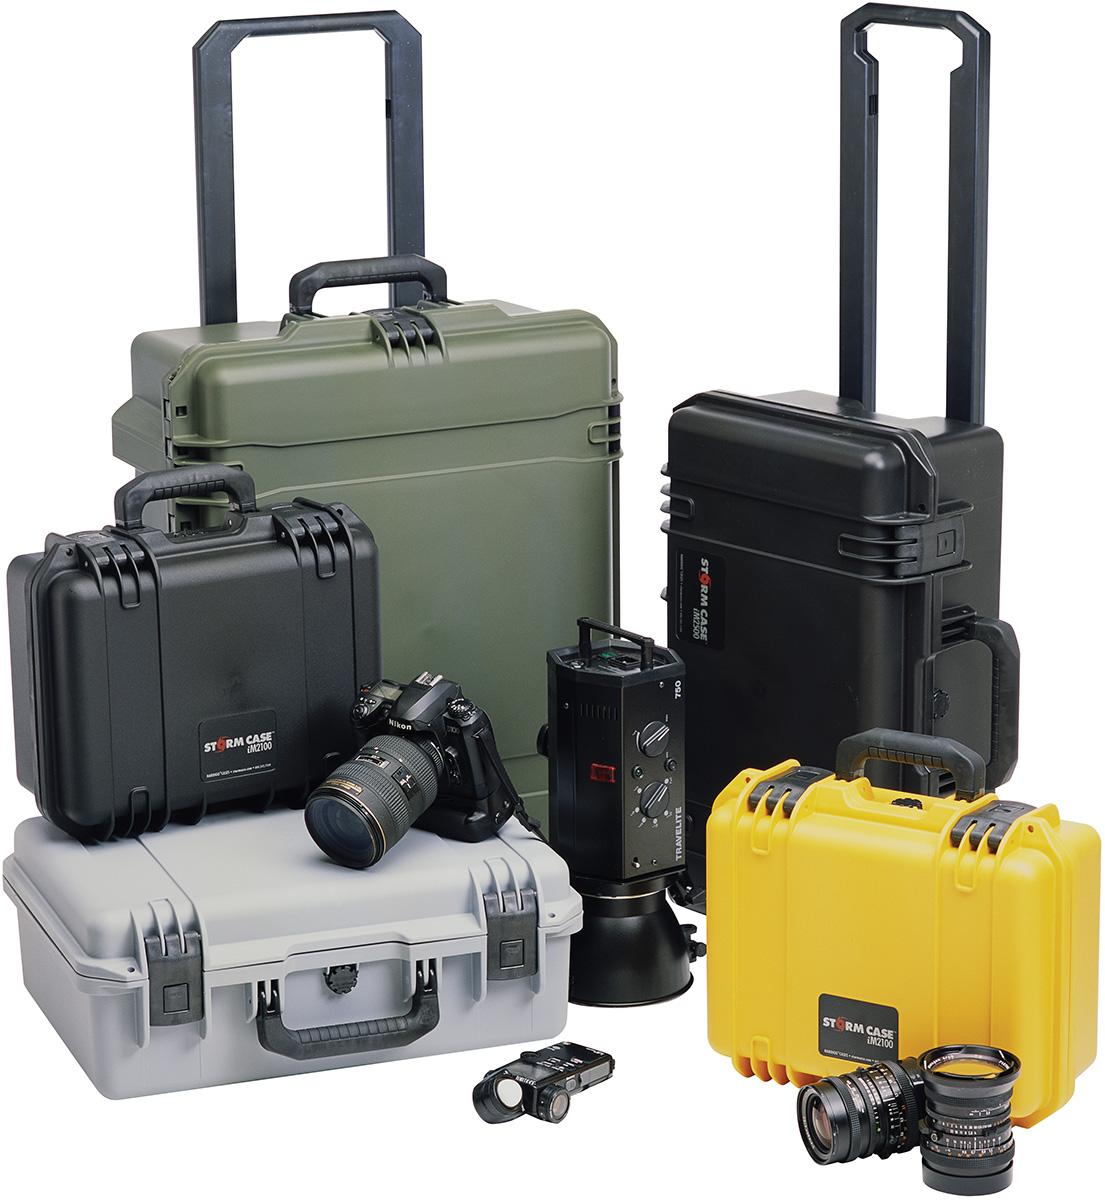 pelican peli products storm photographer camera cases